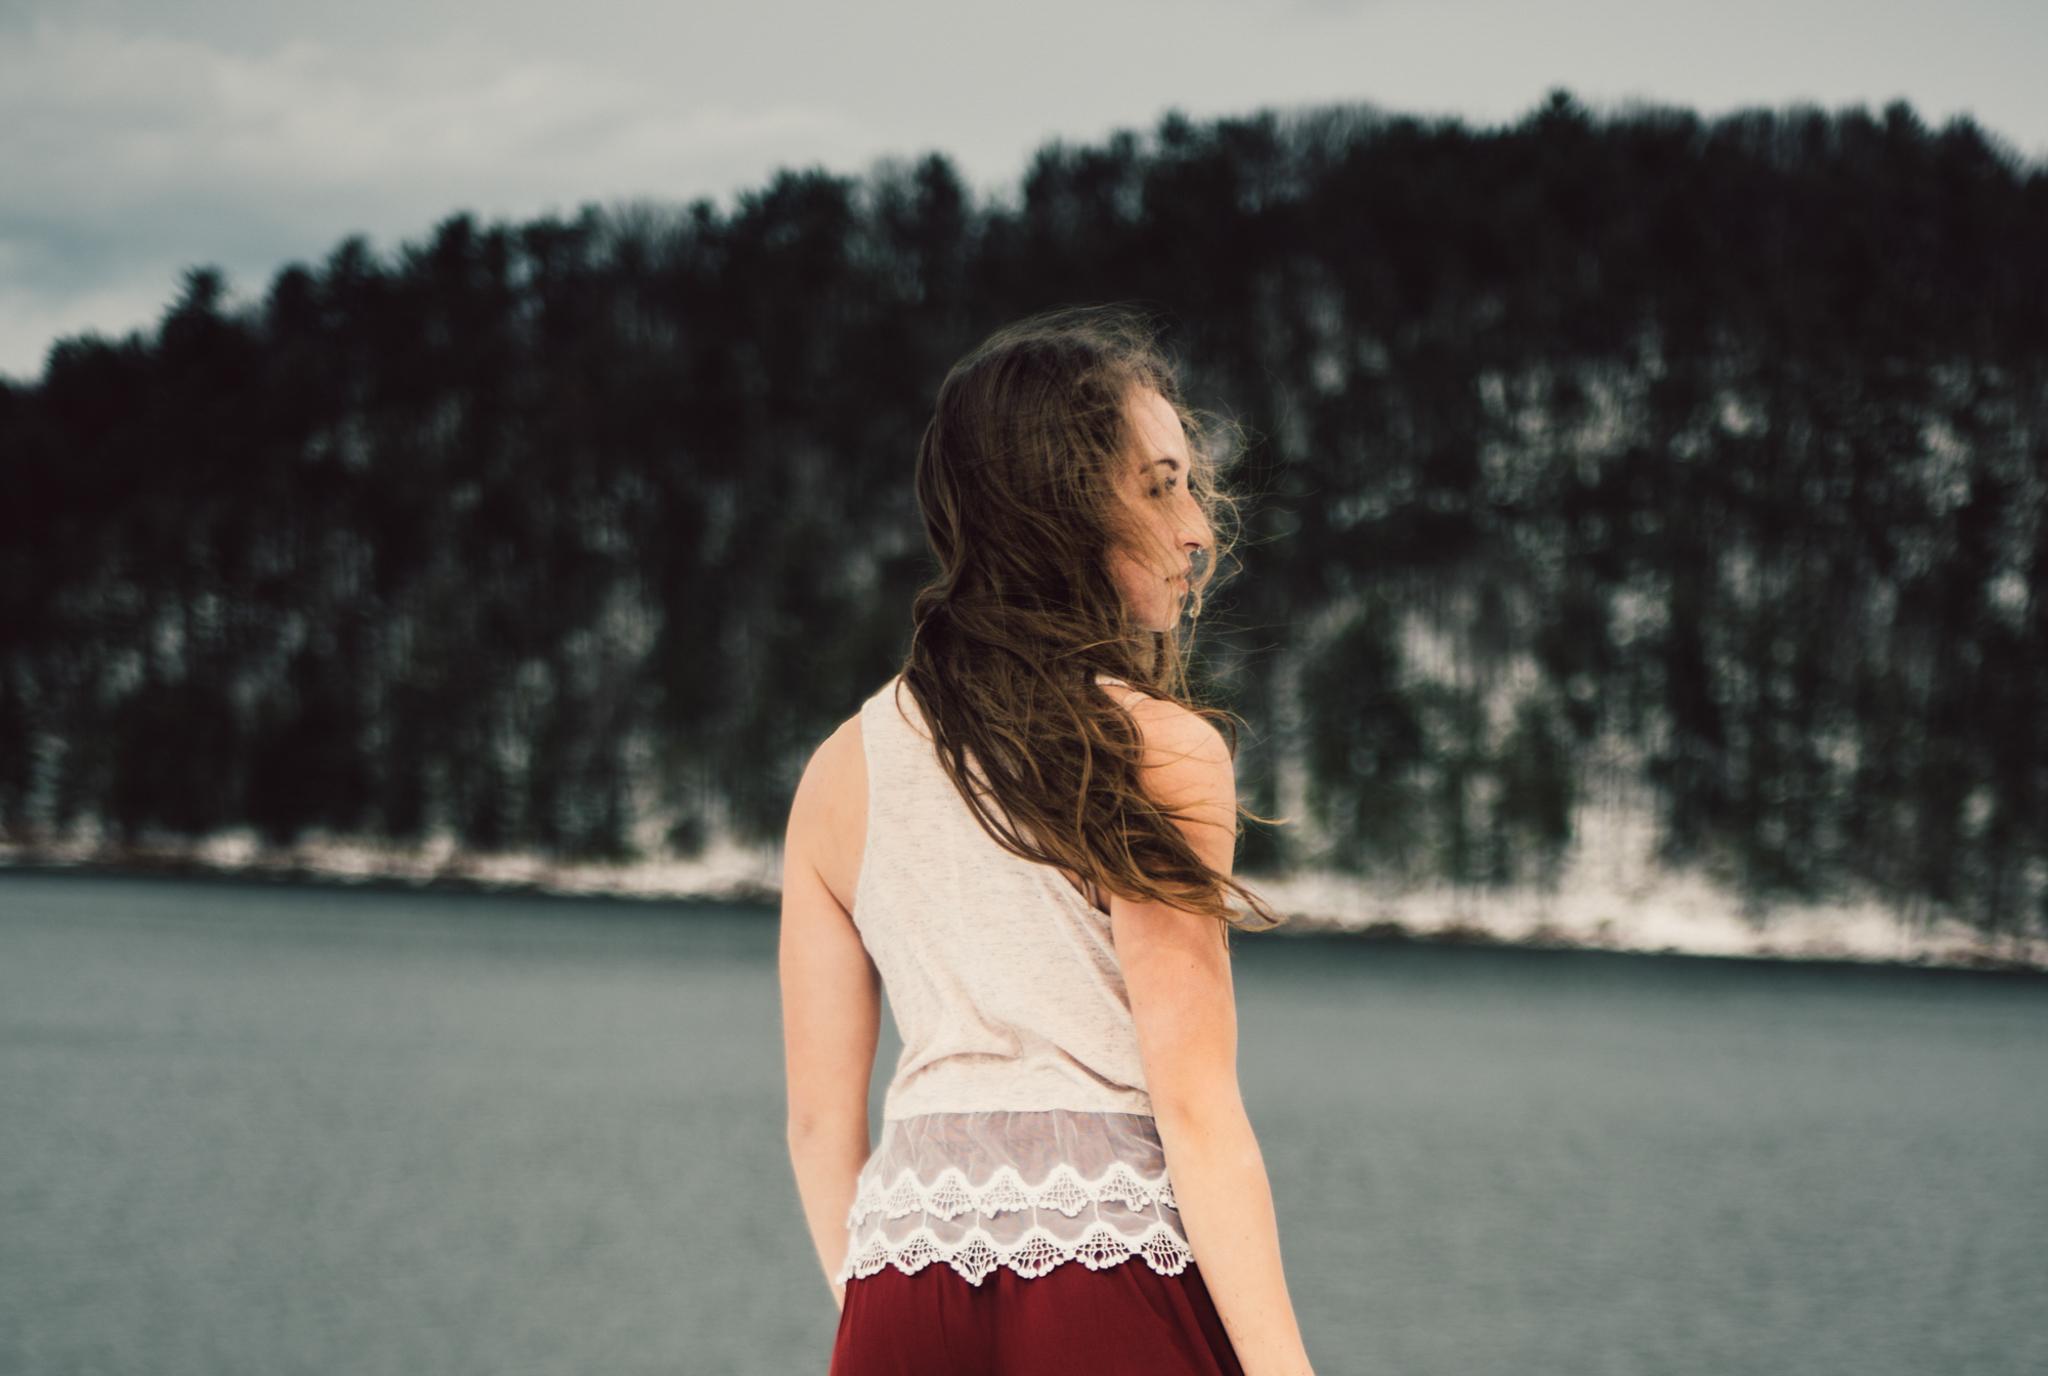 Moody Snowy Portrait Session at Lake Arrowhead in Luray Virginia_6.JPG